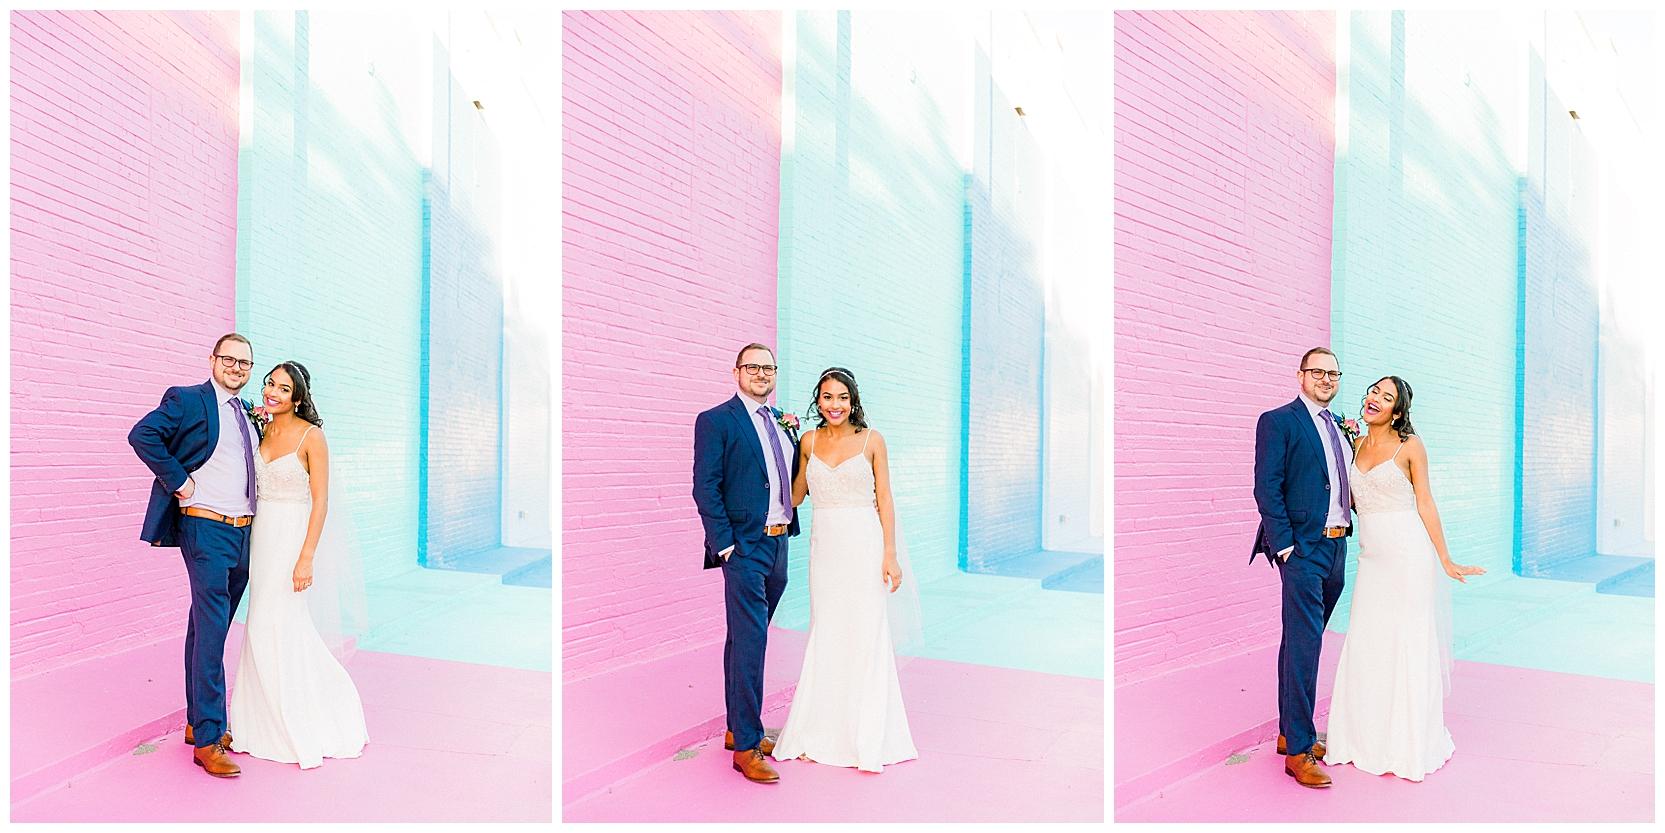 jessicafredericks_lakeland_tampa_wedding_purple_crazy hour_0062.jpg